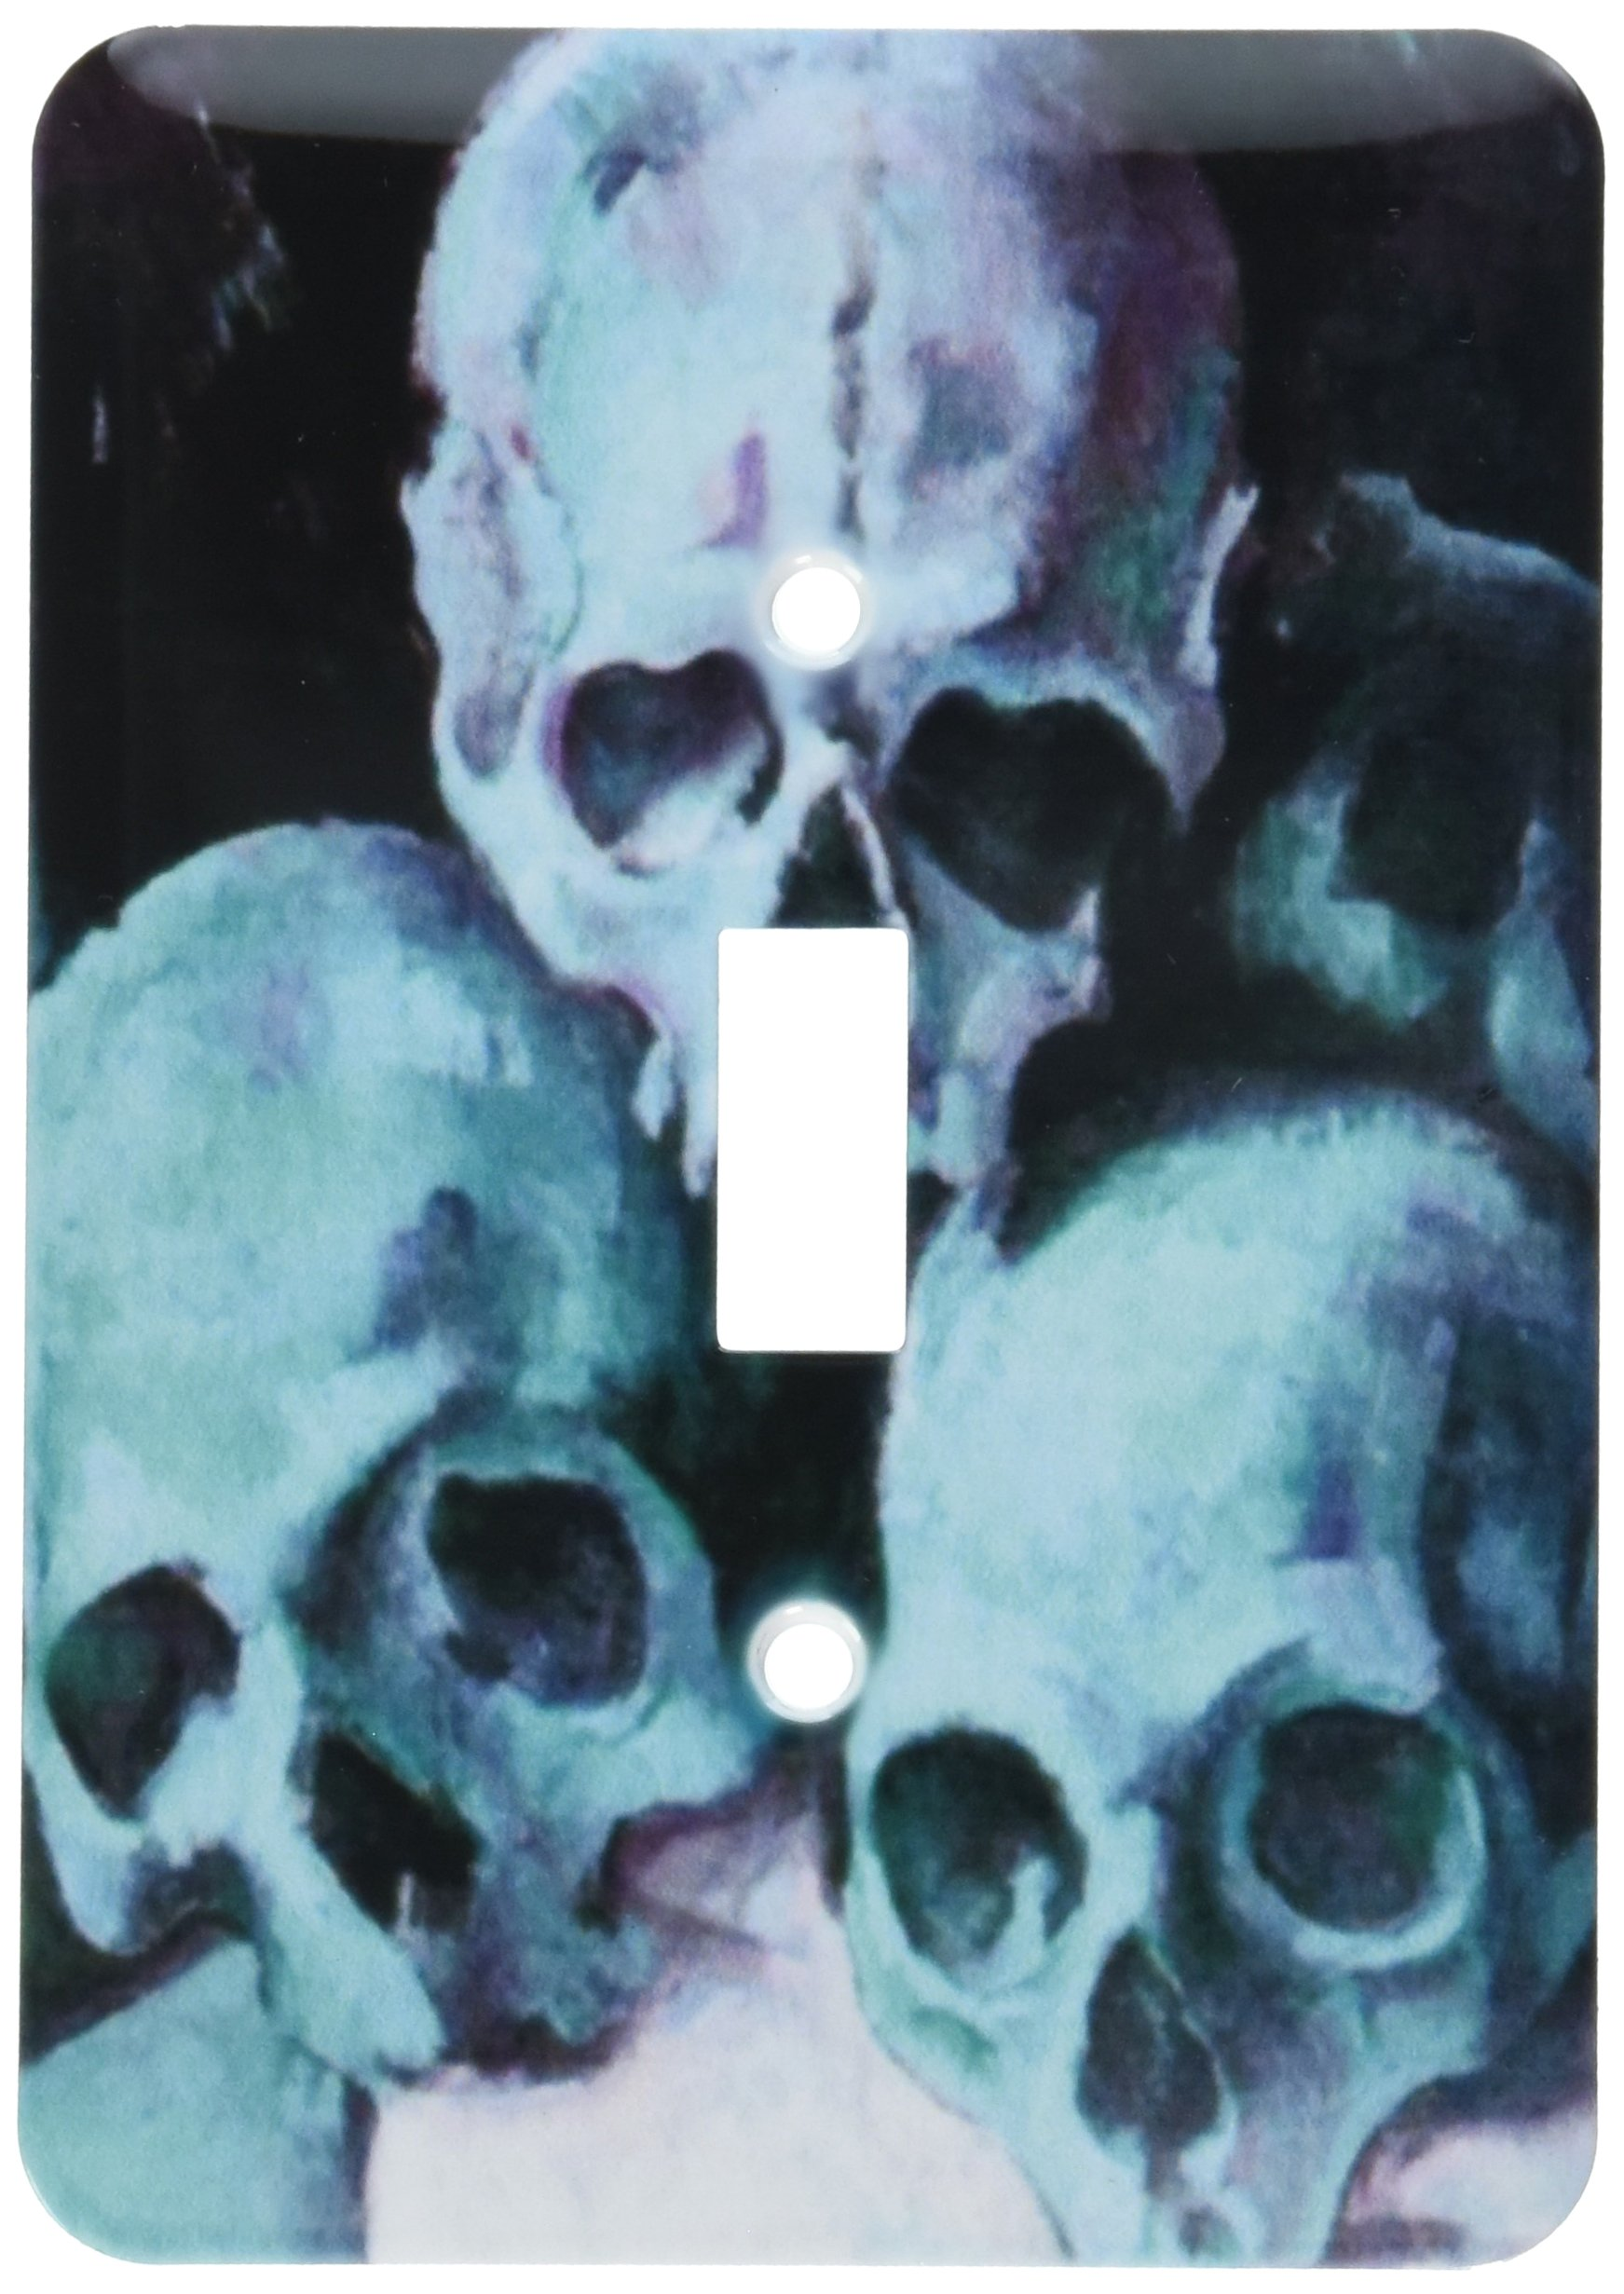 3dRose lsp_46745_1 Pyramid of Skulls Halloween, Skull, Skulls, Teal, Teal Skulls, Halloween Party, Pyramid of Skulls Light Switch Cover